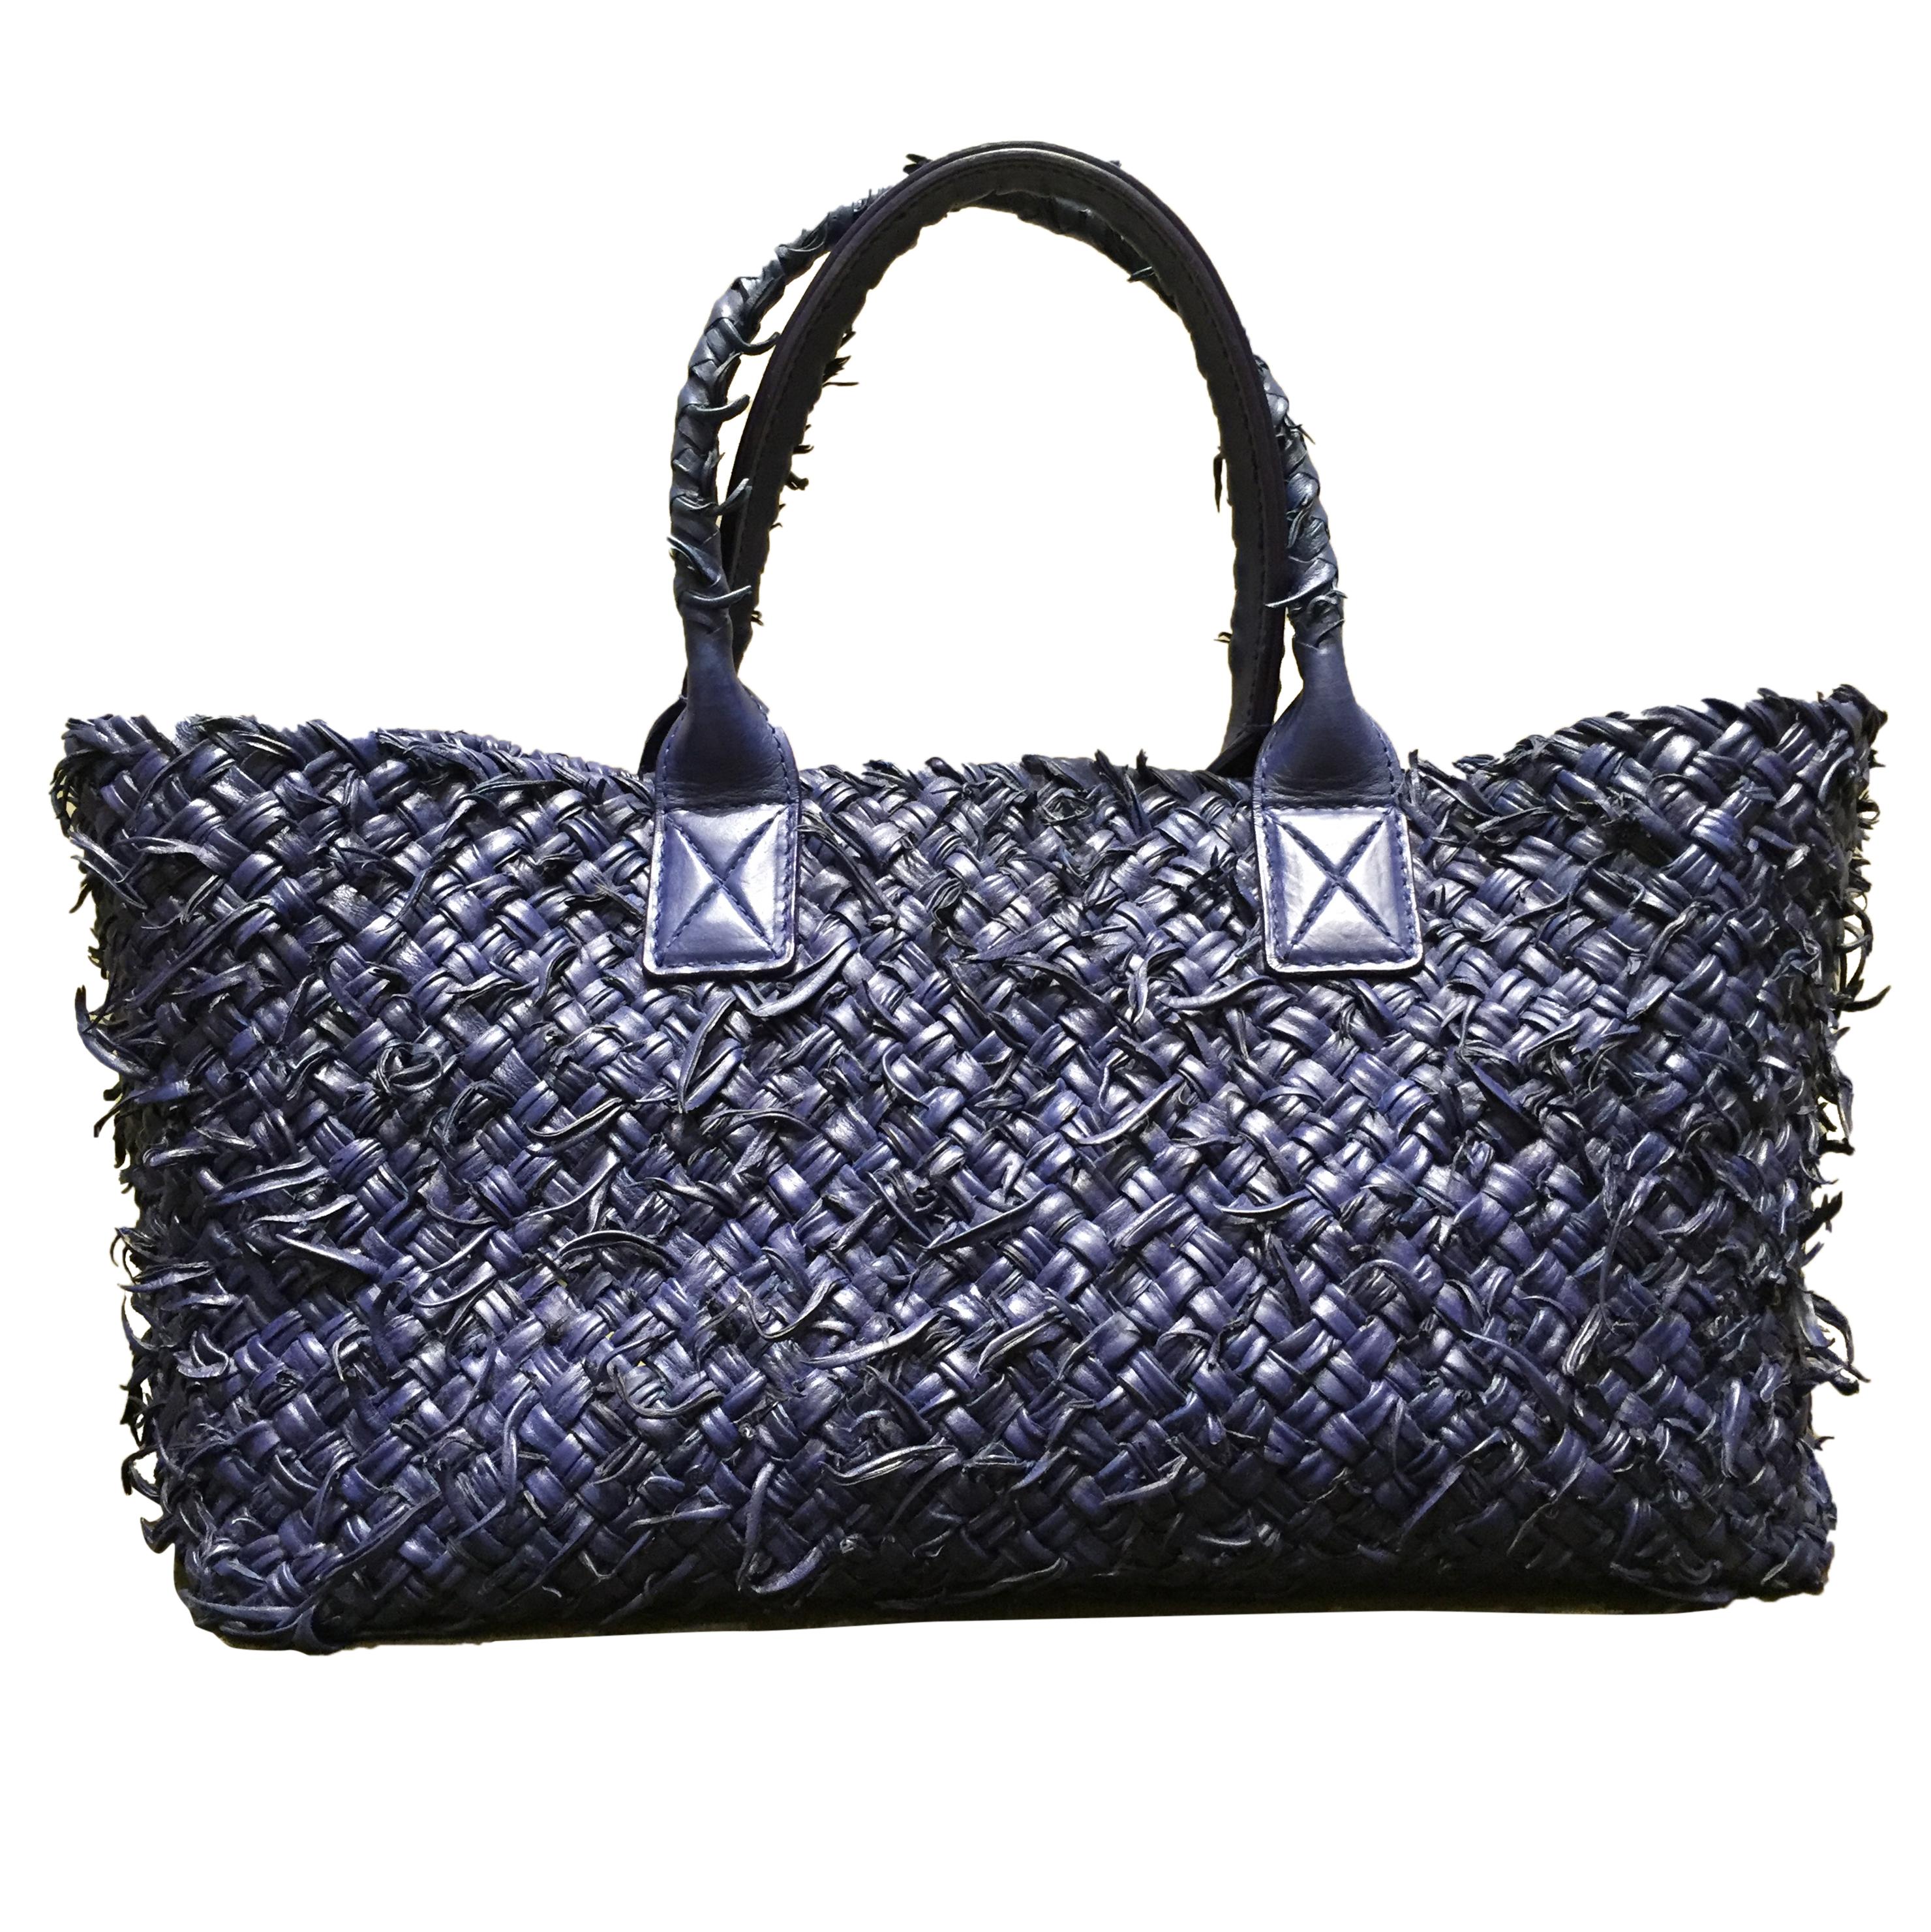 367d376d4f409 Bottega Veneta Limited Edition Sapphire Cabat Fuzzy Bag067116   HEWI ...